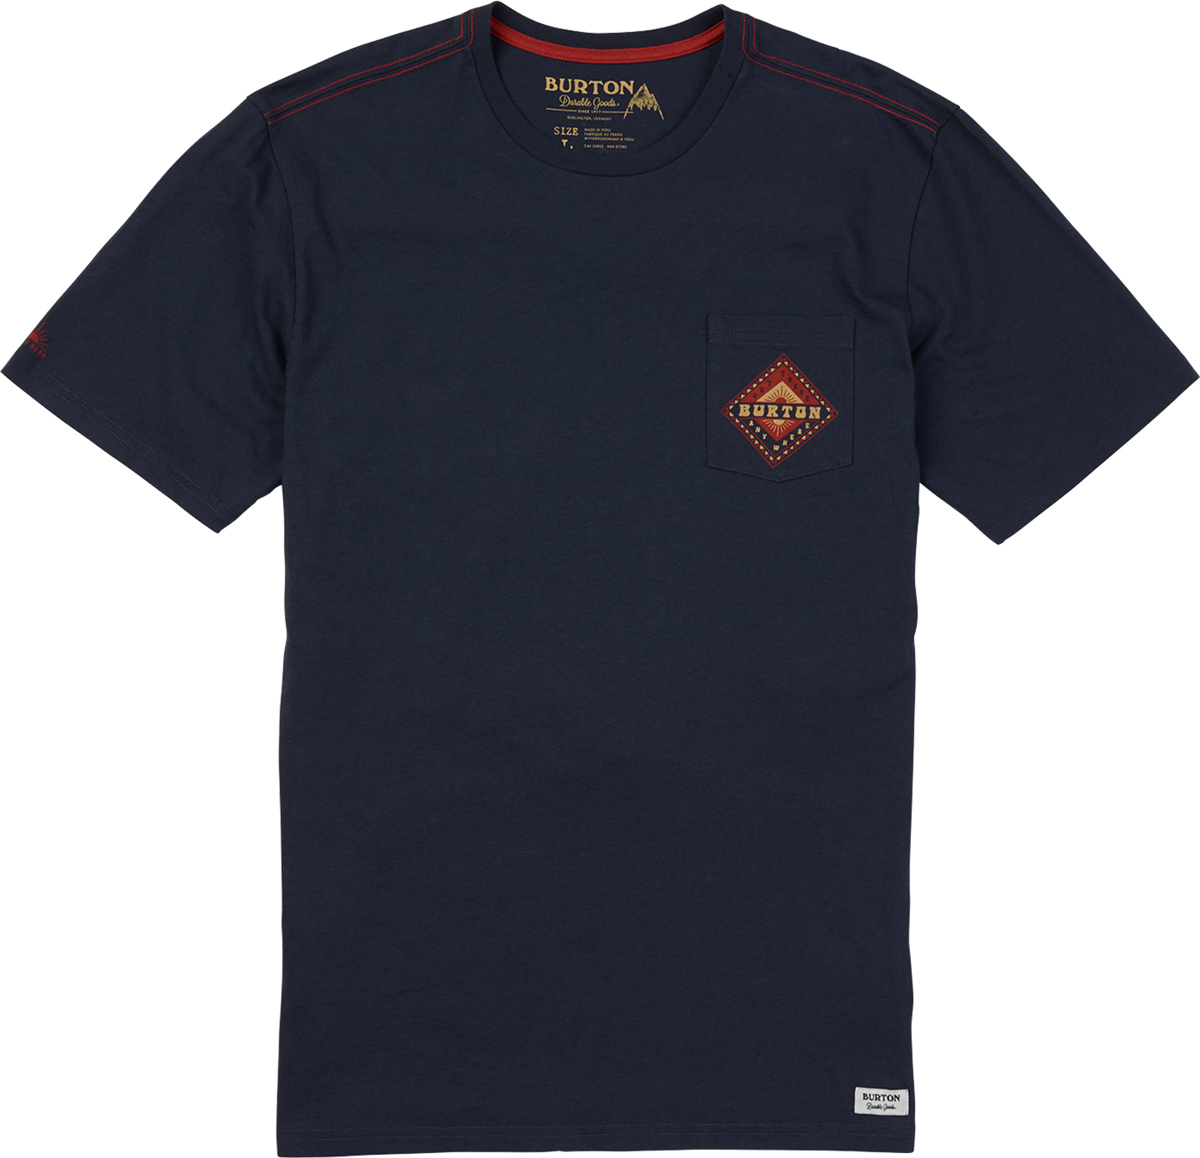 Футболка мужская Burton Mb Anchor Point Ss, цвет: темно-синий. 19694100400. Размер XXL (54)